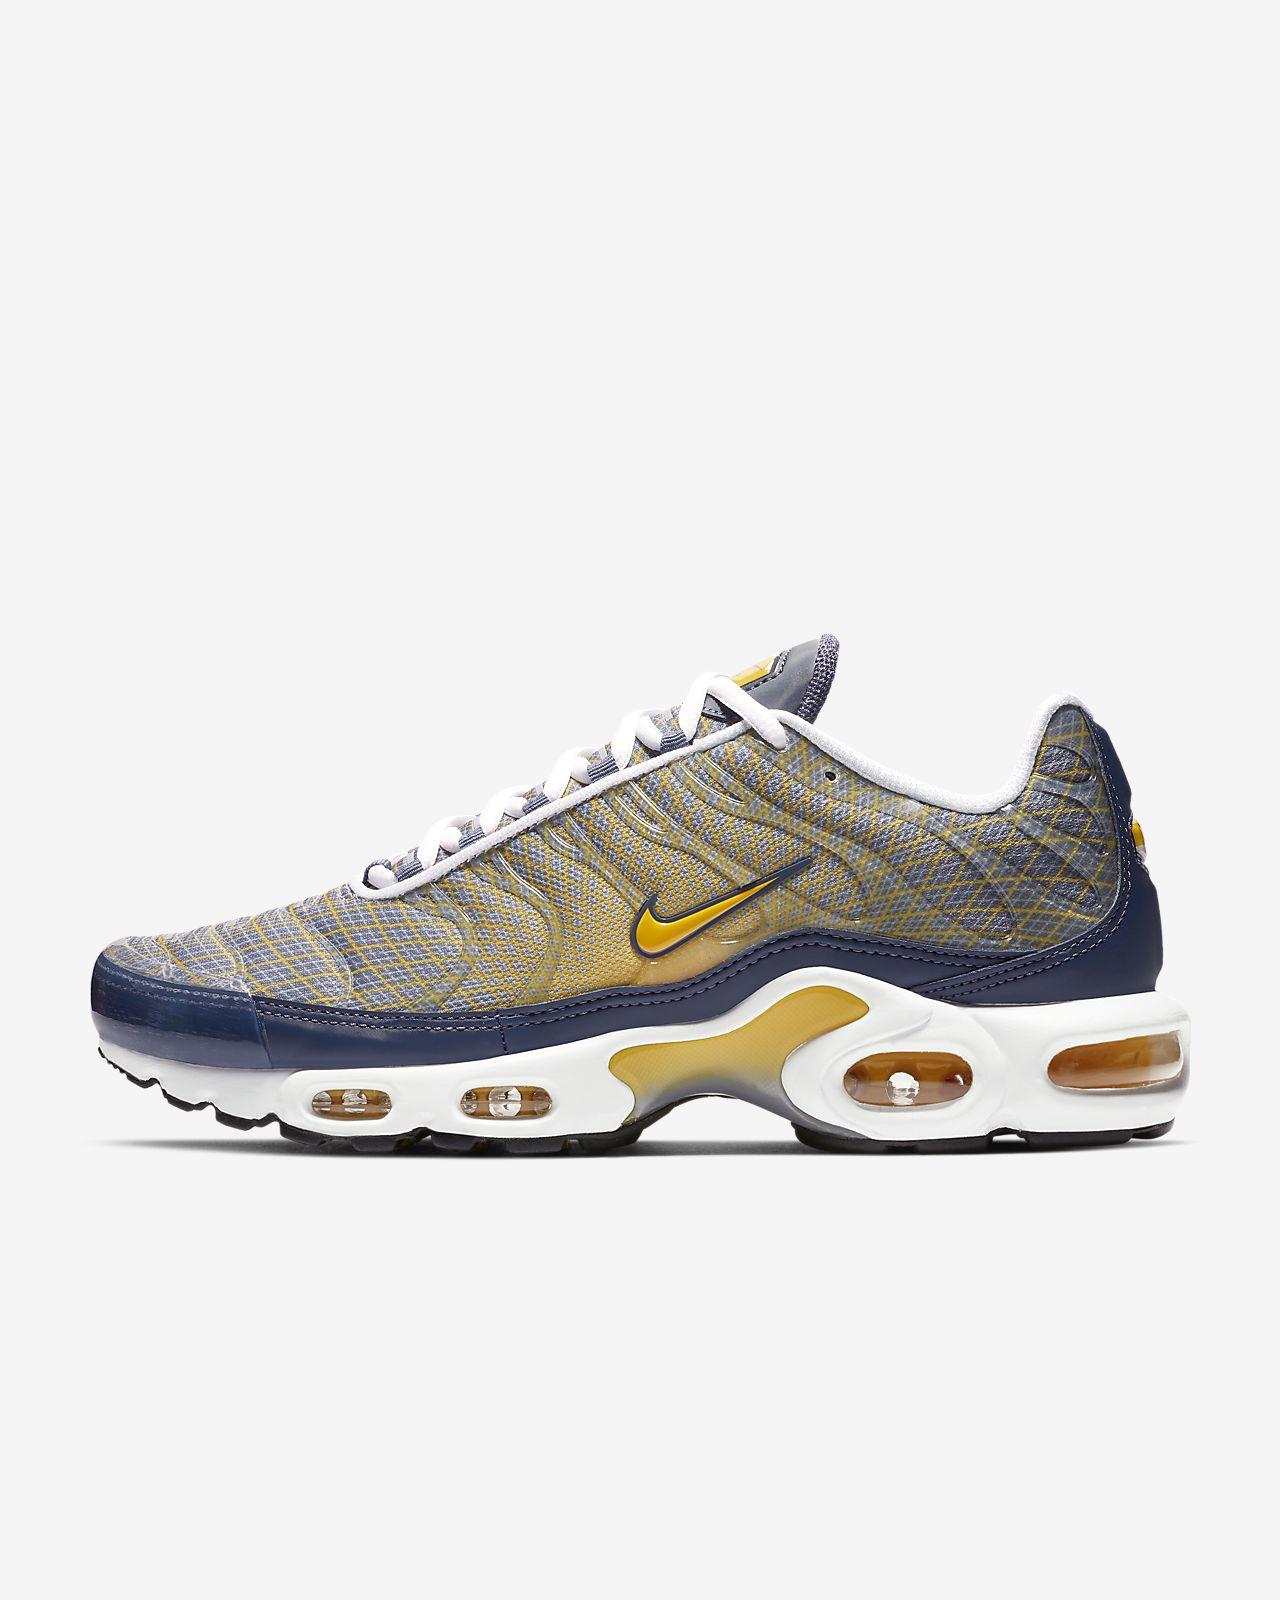 Acheter des chaussures d'origine Nike Running Air Max